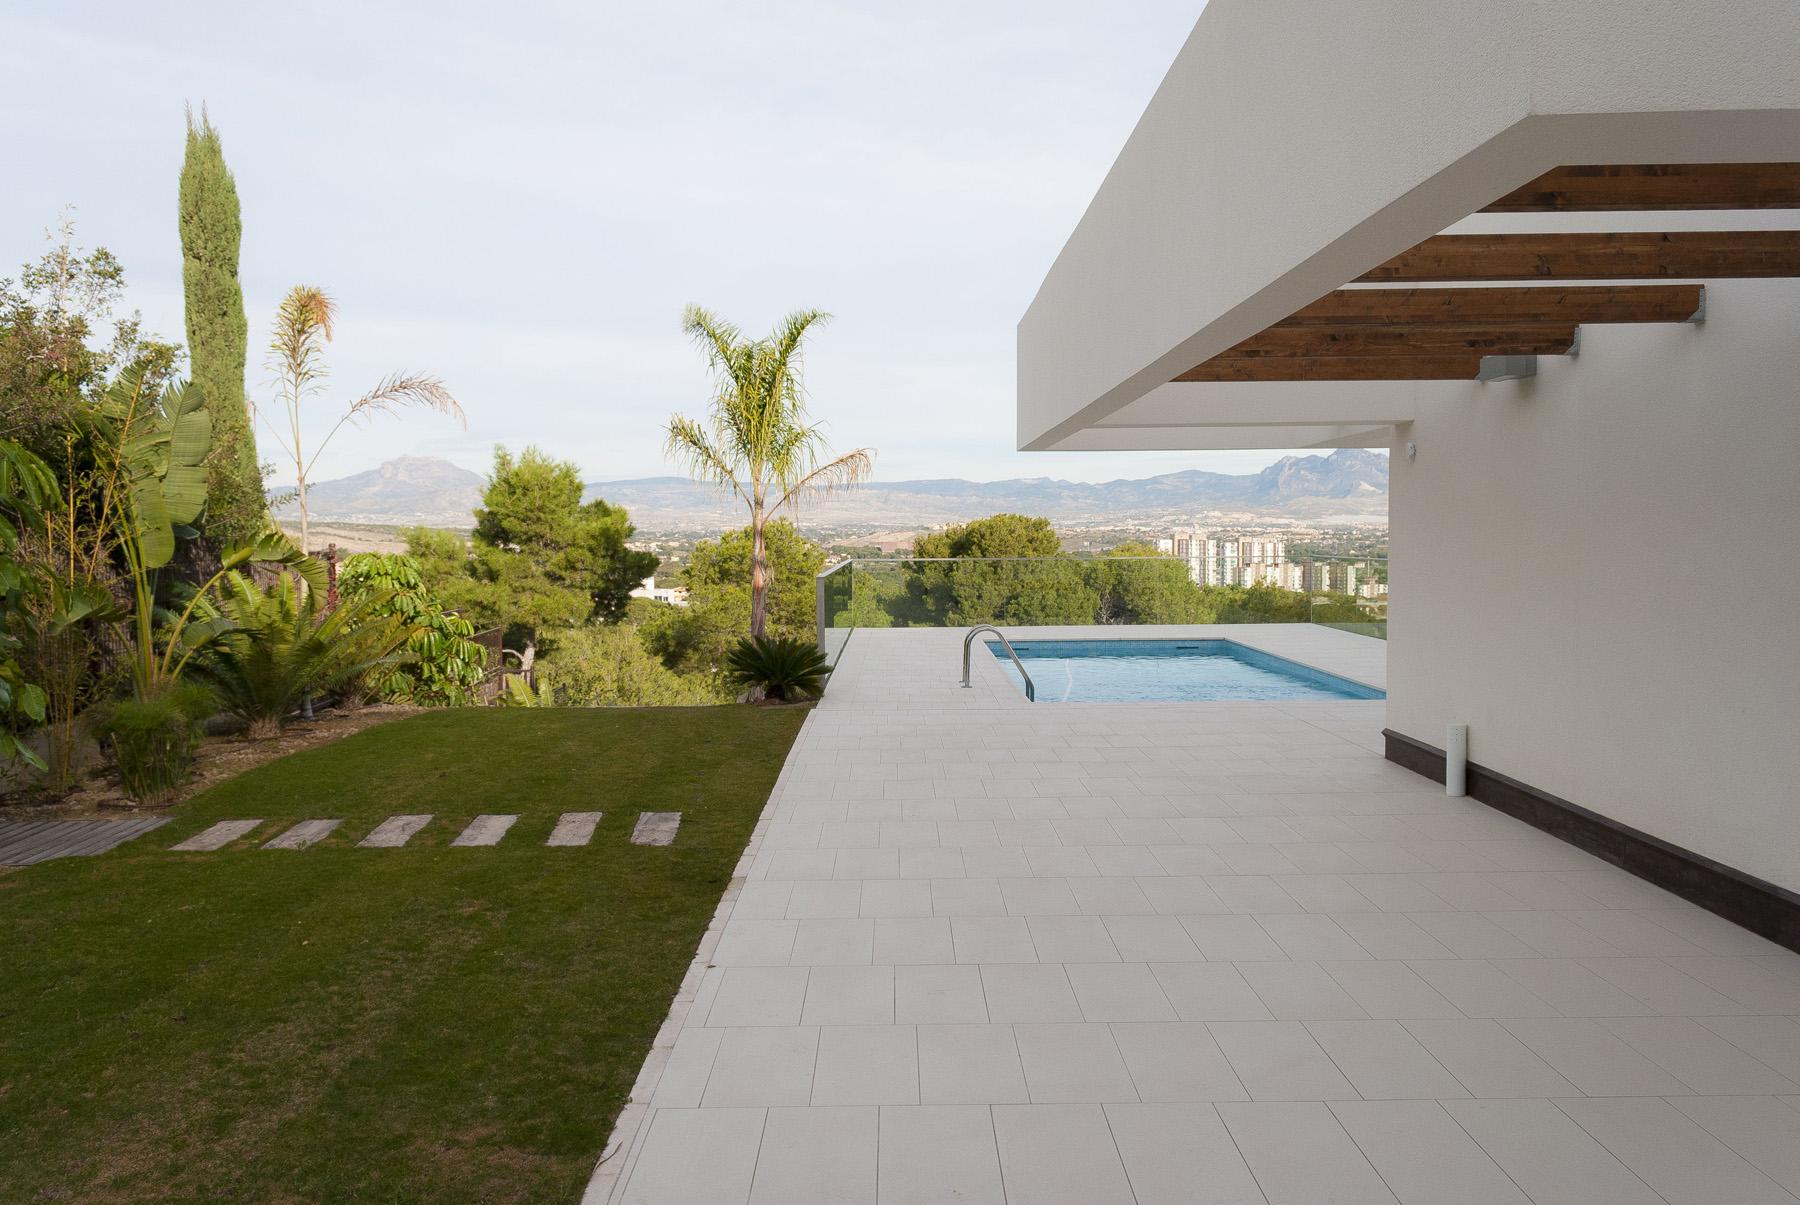 Diseno jardin mediterraneo david jim nez arquitectura y for Diseno jardin mediterraneo